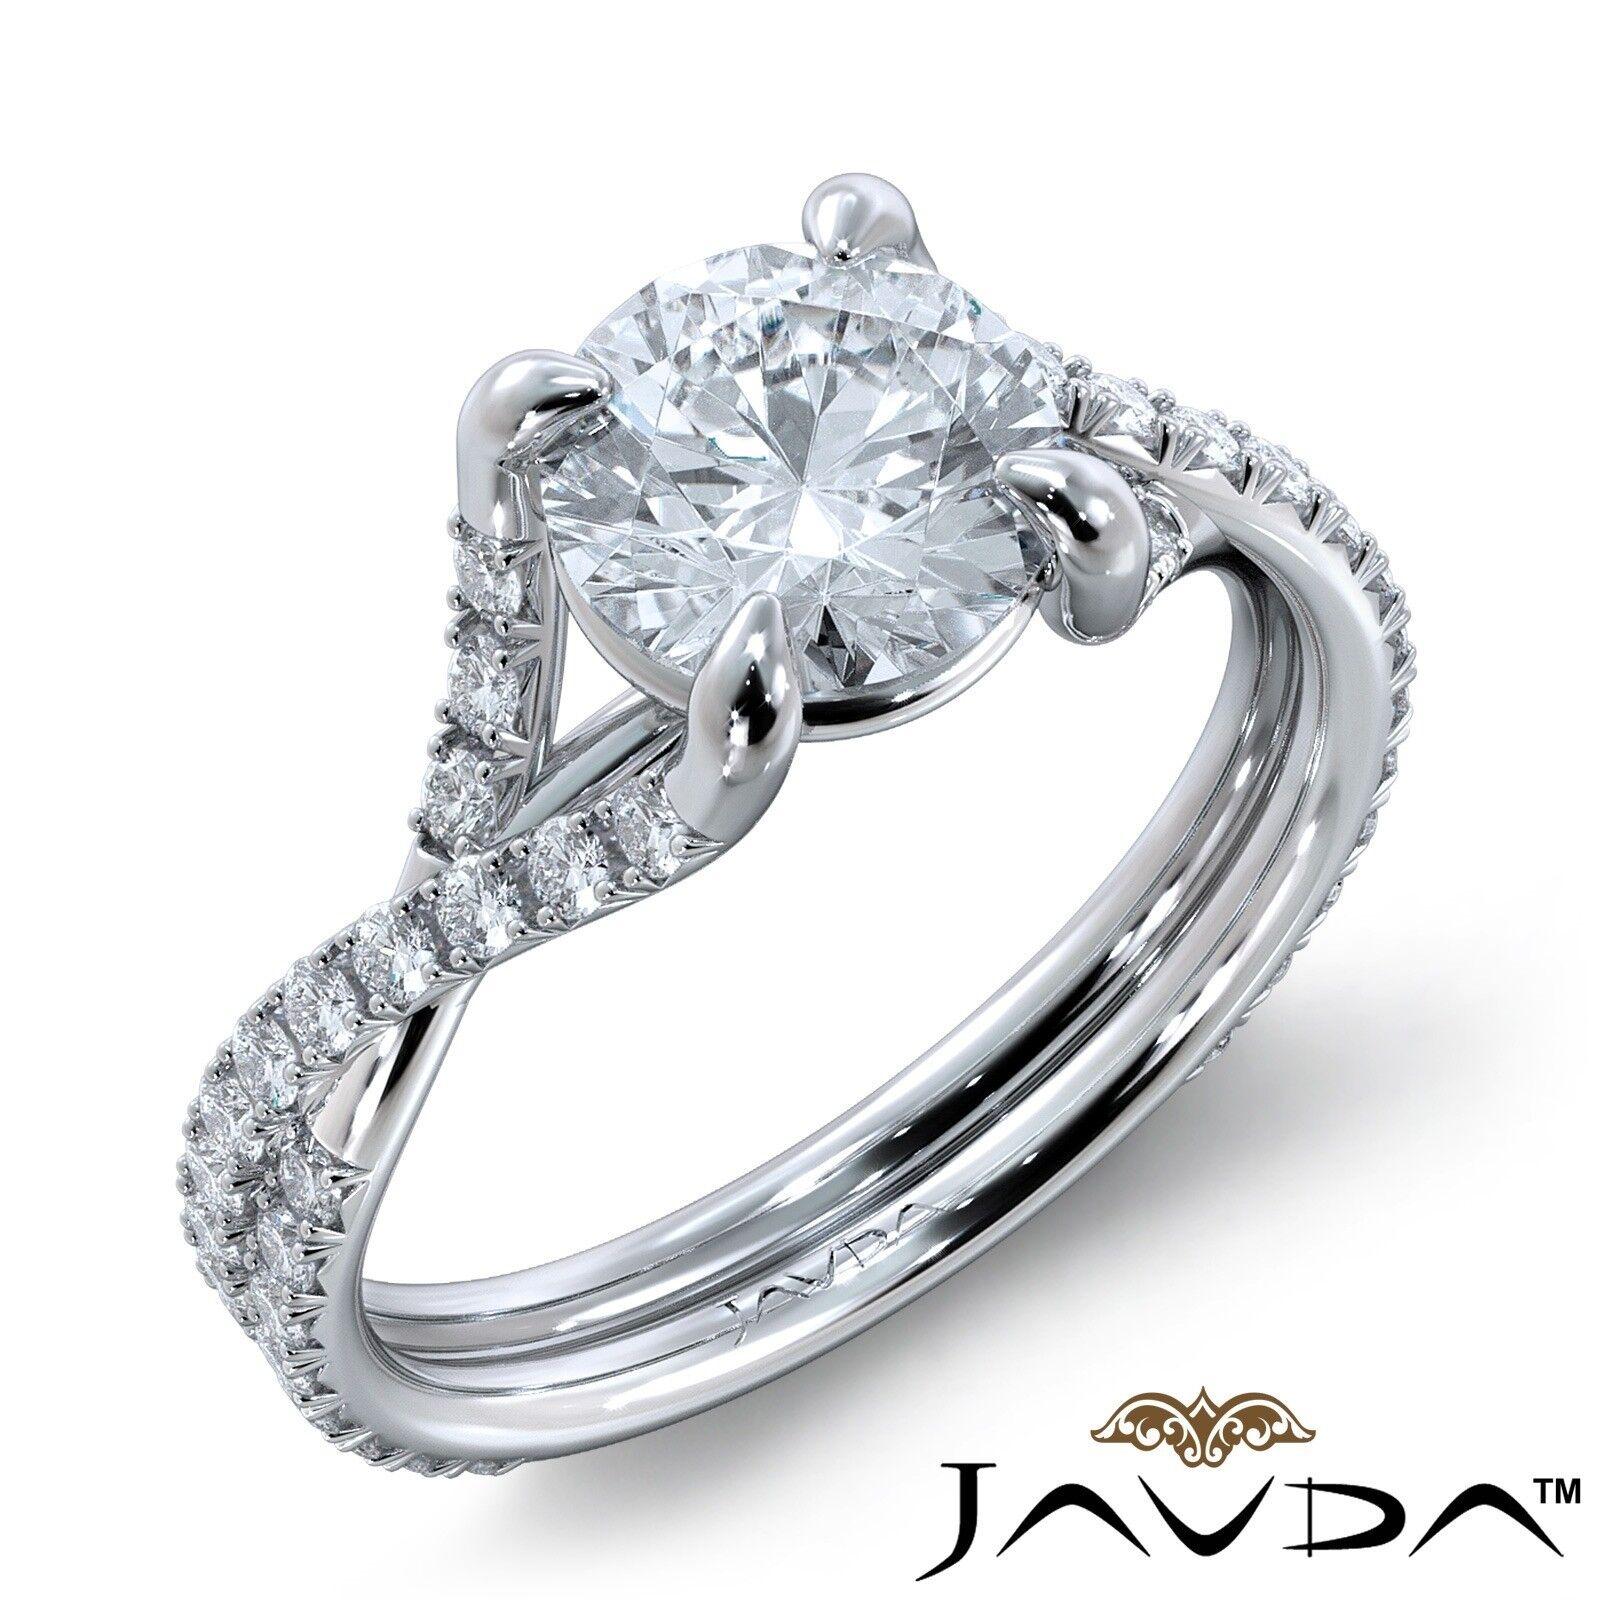 2.39ctw French Cut Sidestone Round Diamond Engagement Ring GIA F-VVS1 White Gold